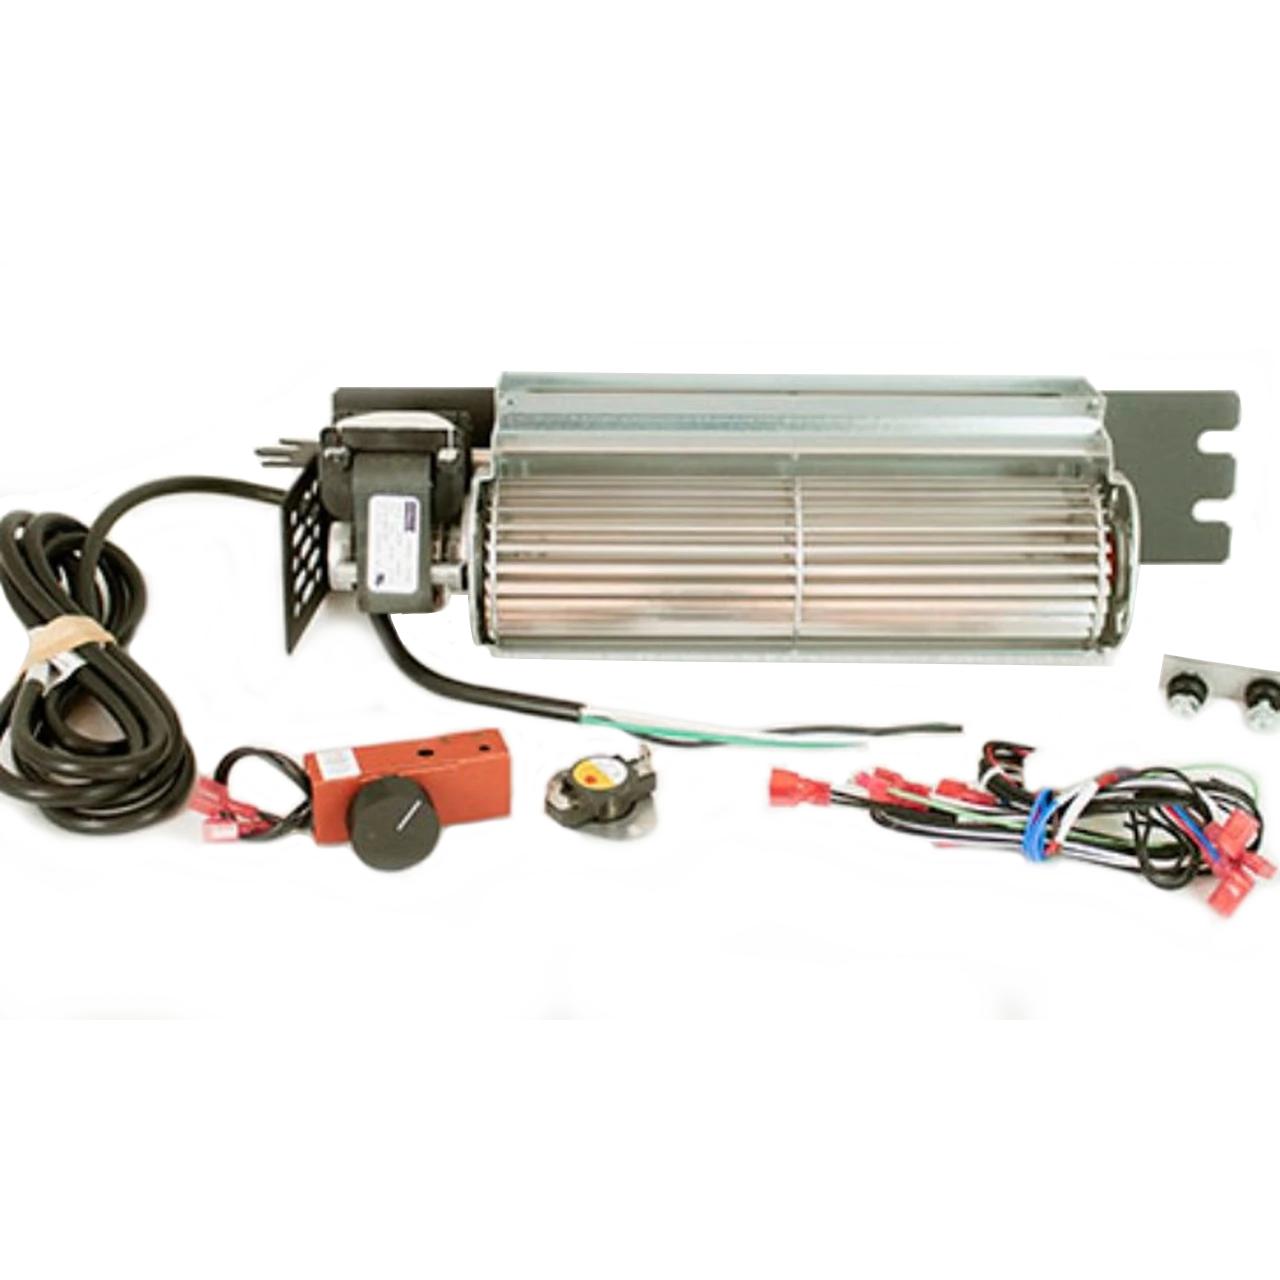 99000153 Avalon, Lopi, Travis, Freestanding Gas Stove Blower Kit